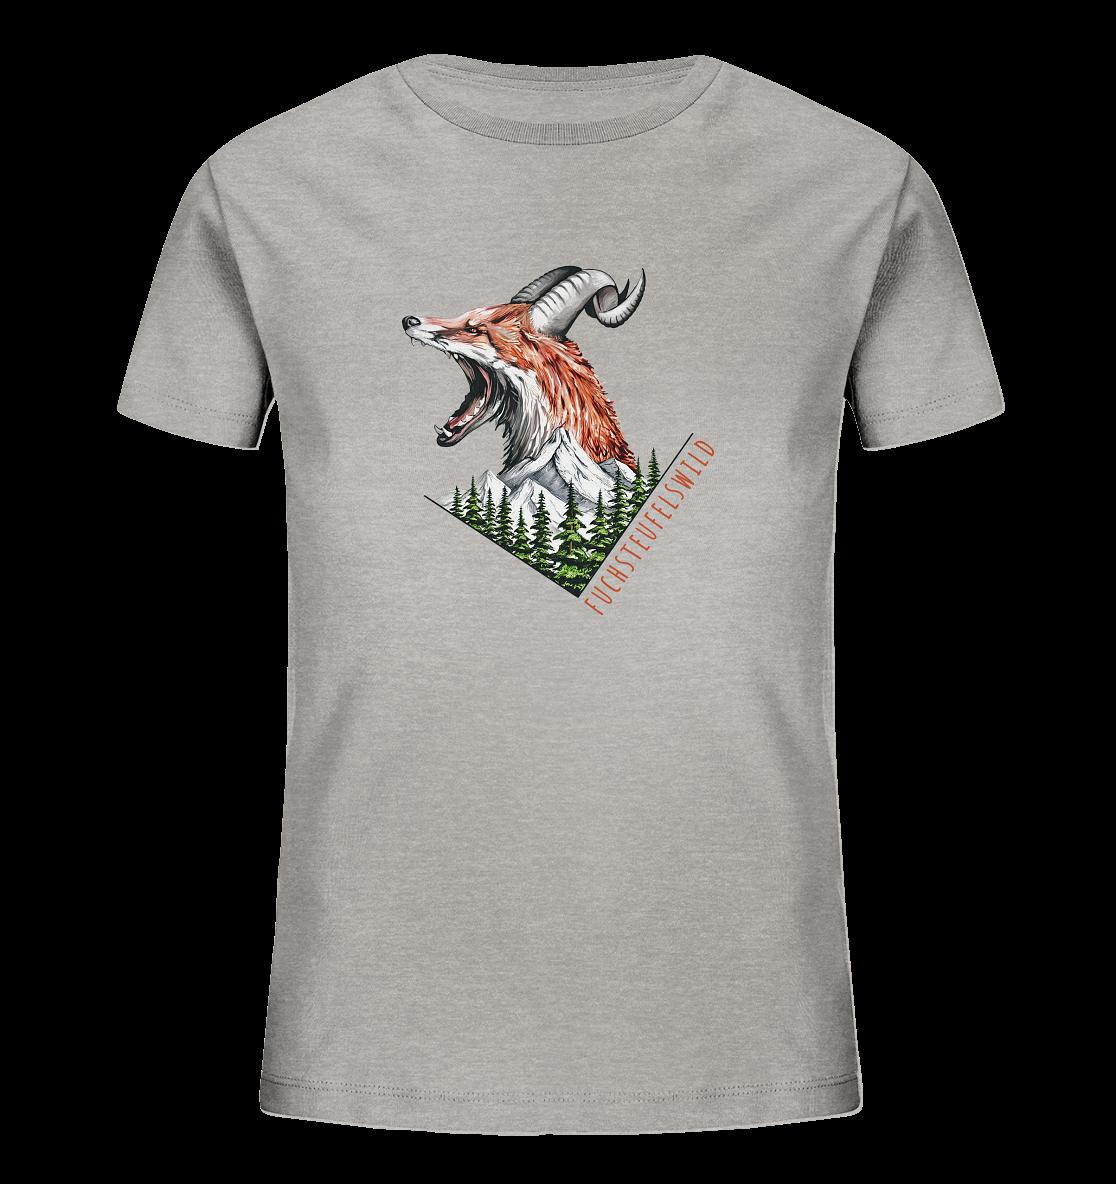 front-kids-organic-shirt-c2c1c0-1116x-2.png